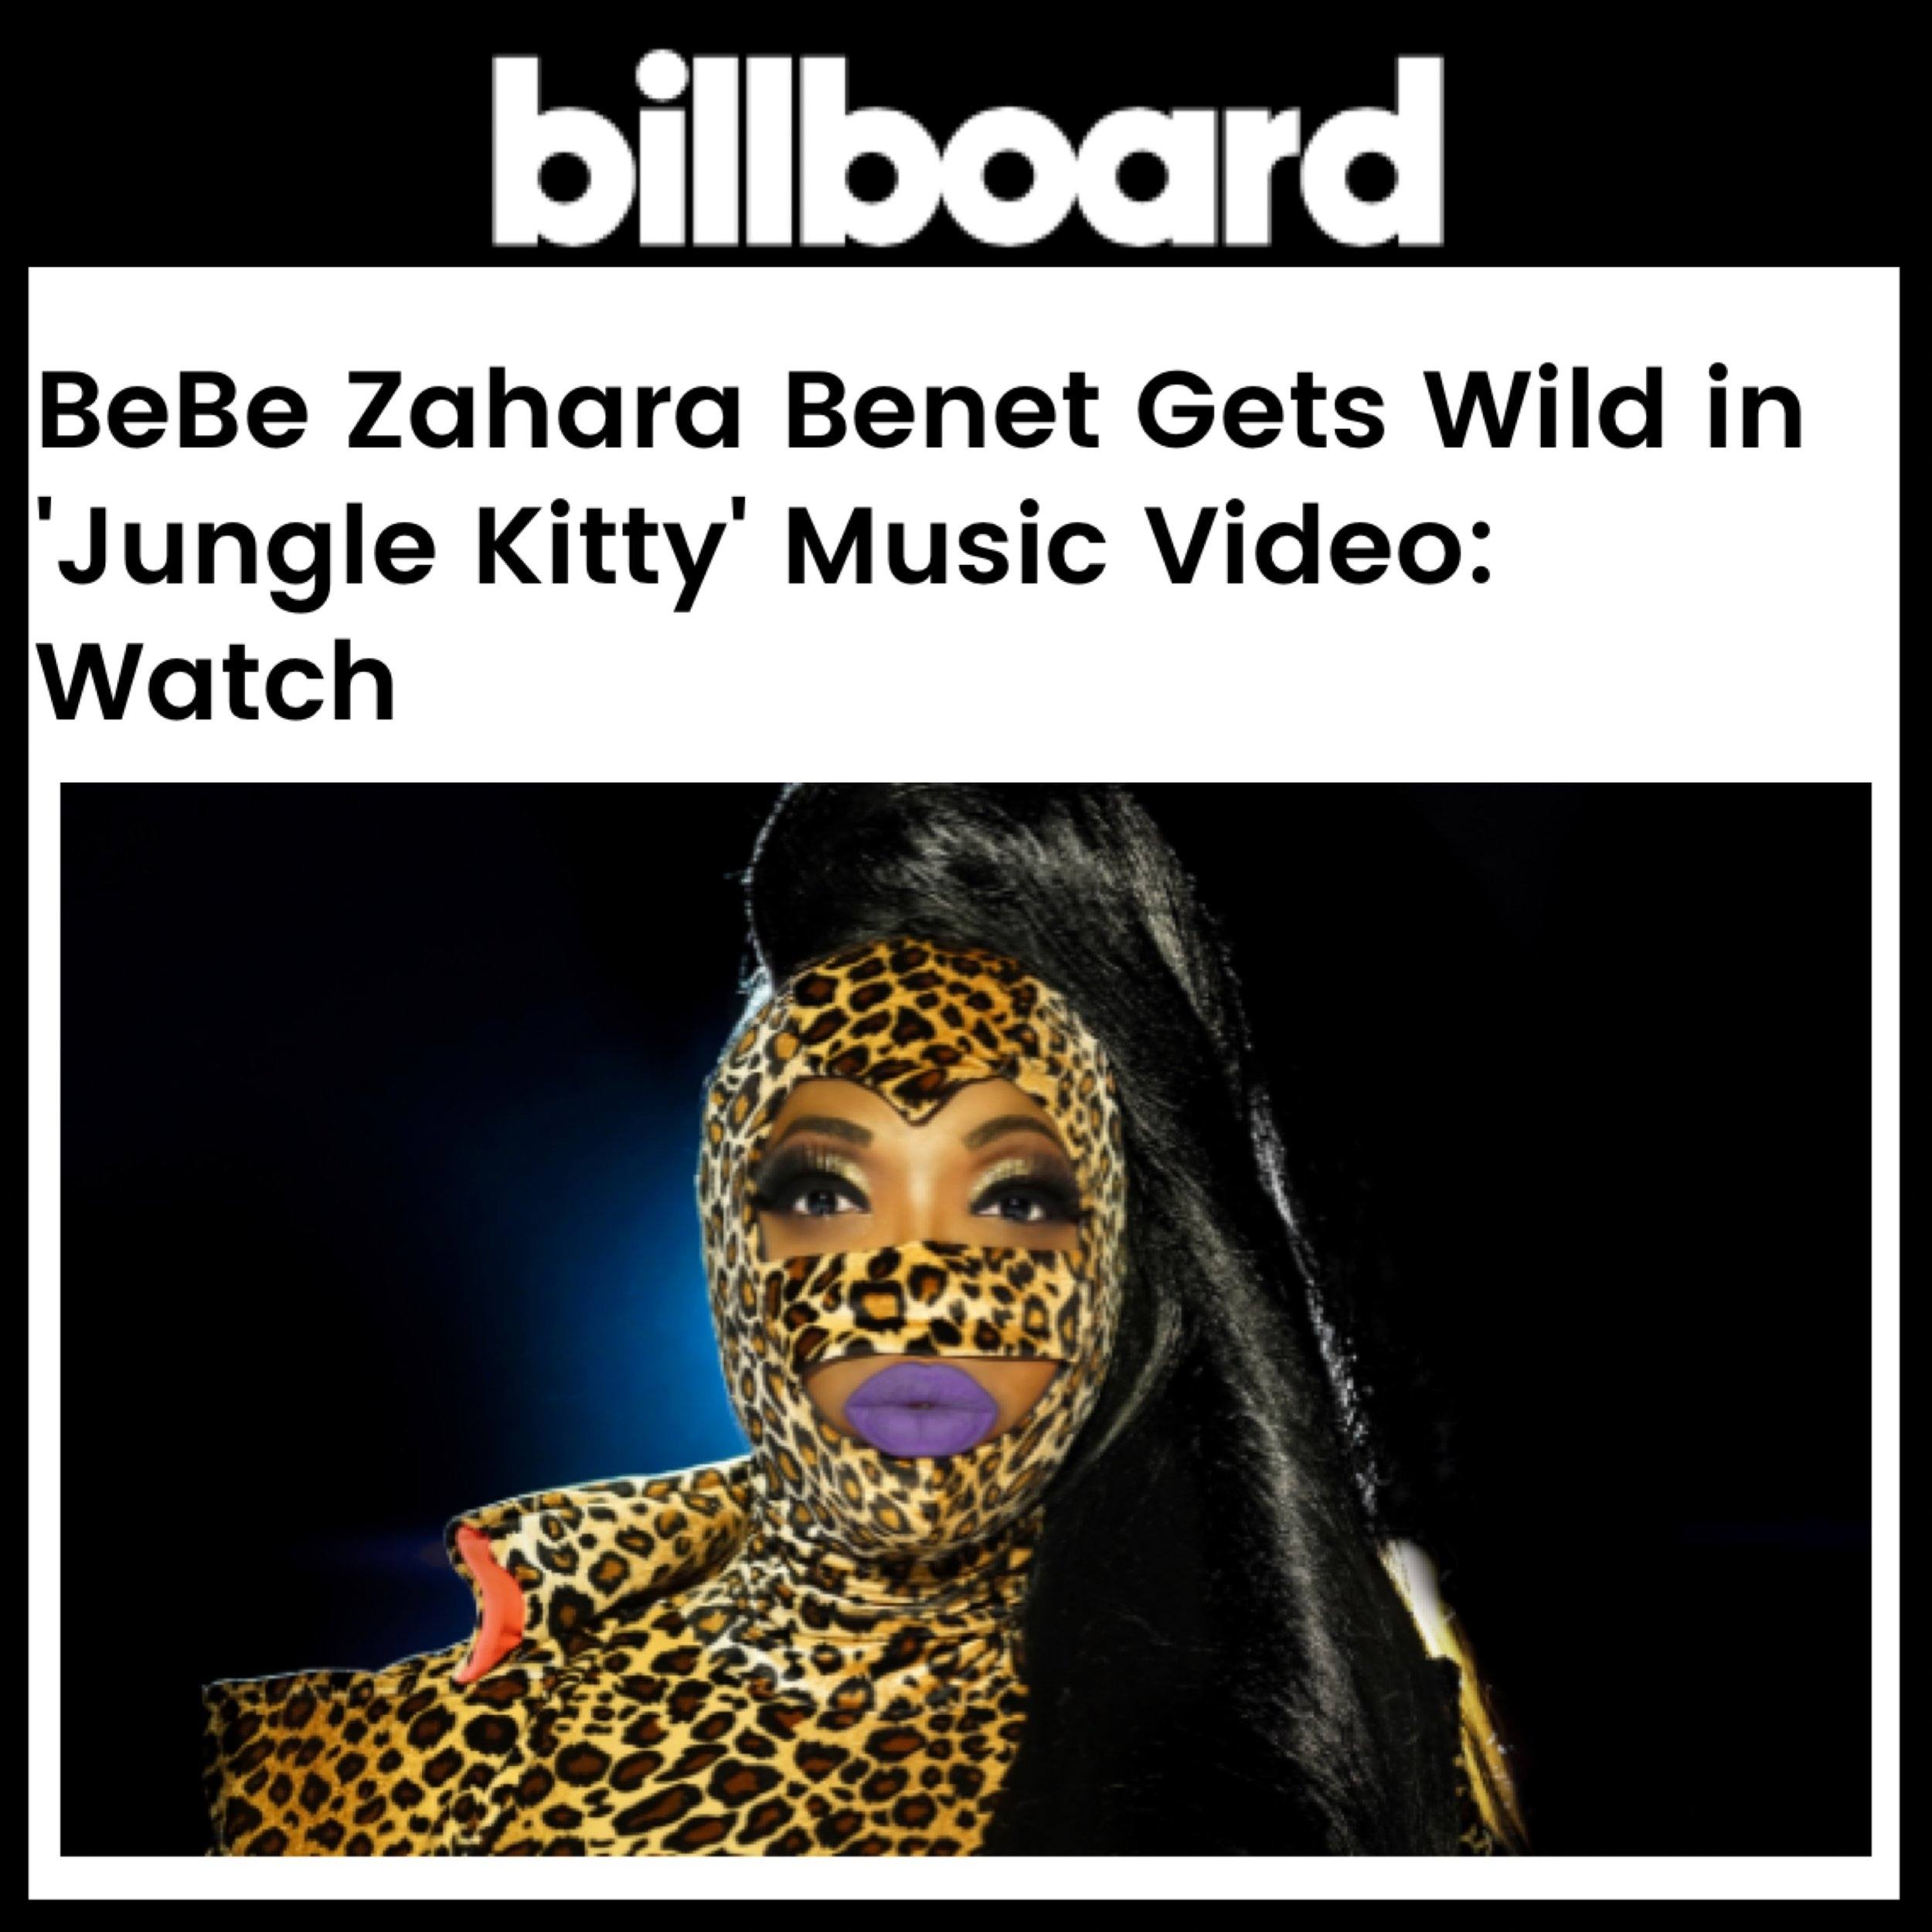 BILLBOARD - BEBE ZAHARA BENET (JUNGLE KITTY)